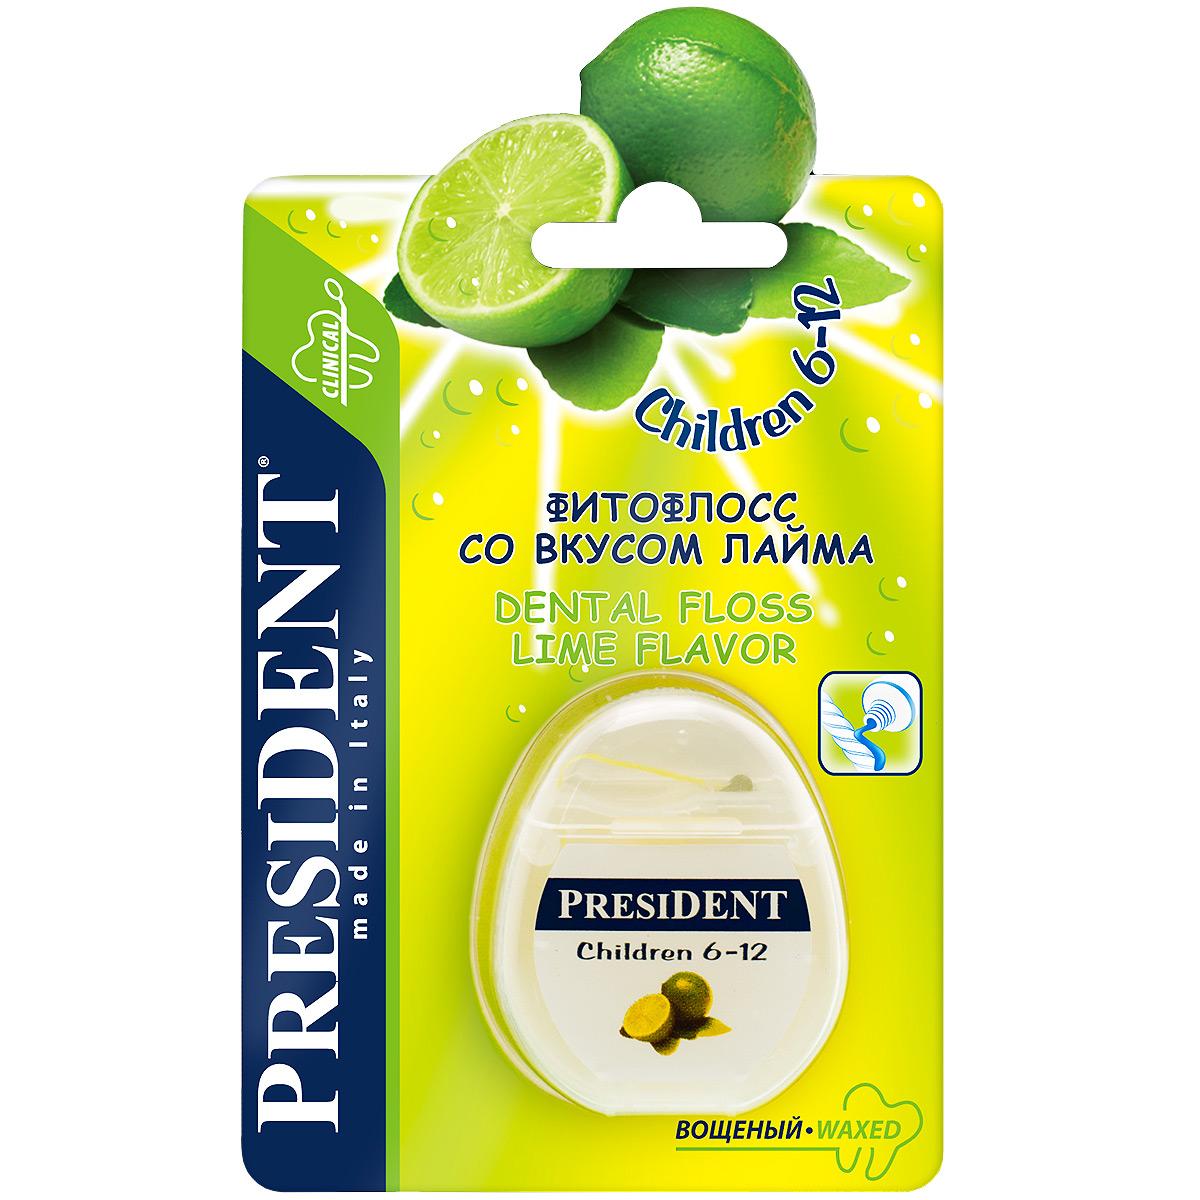 President Фитофлосс Children 6-12, со вкусом лайма пленка тонировочная president 5% 0 5м х 3м